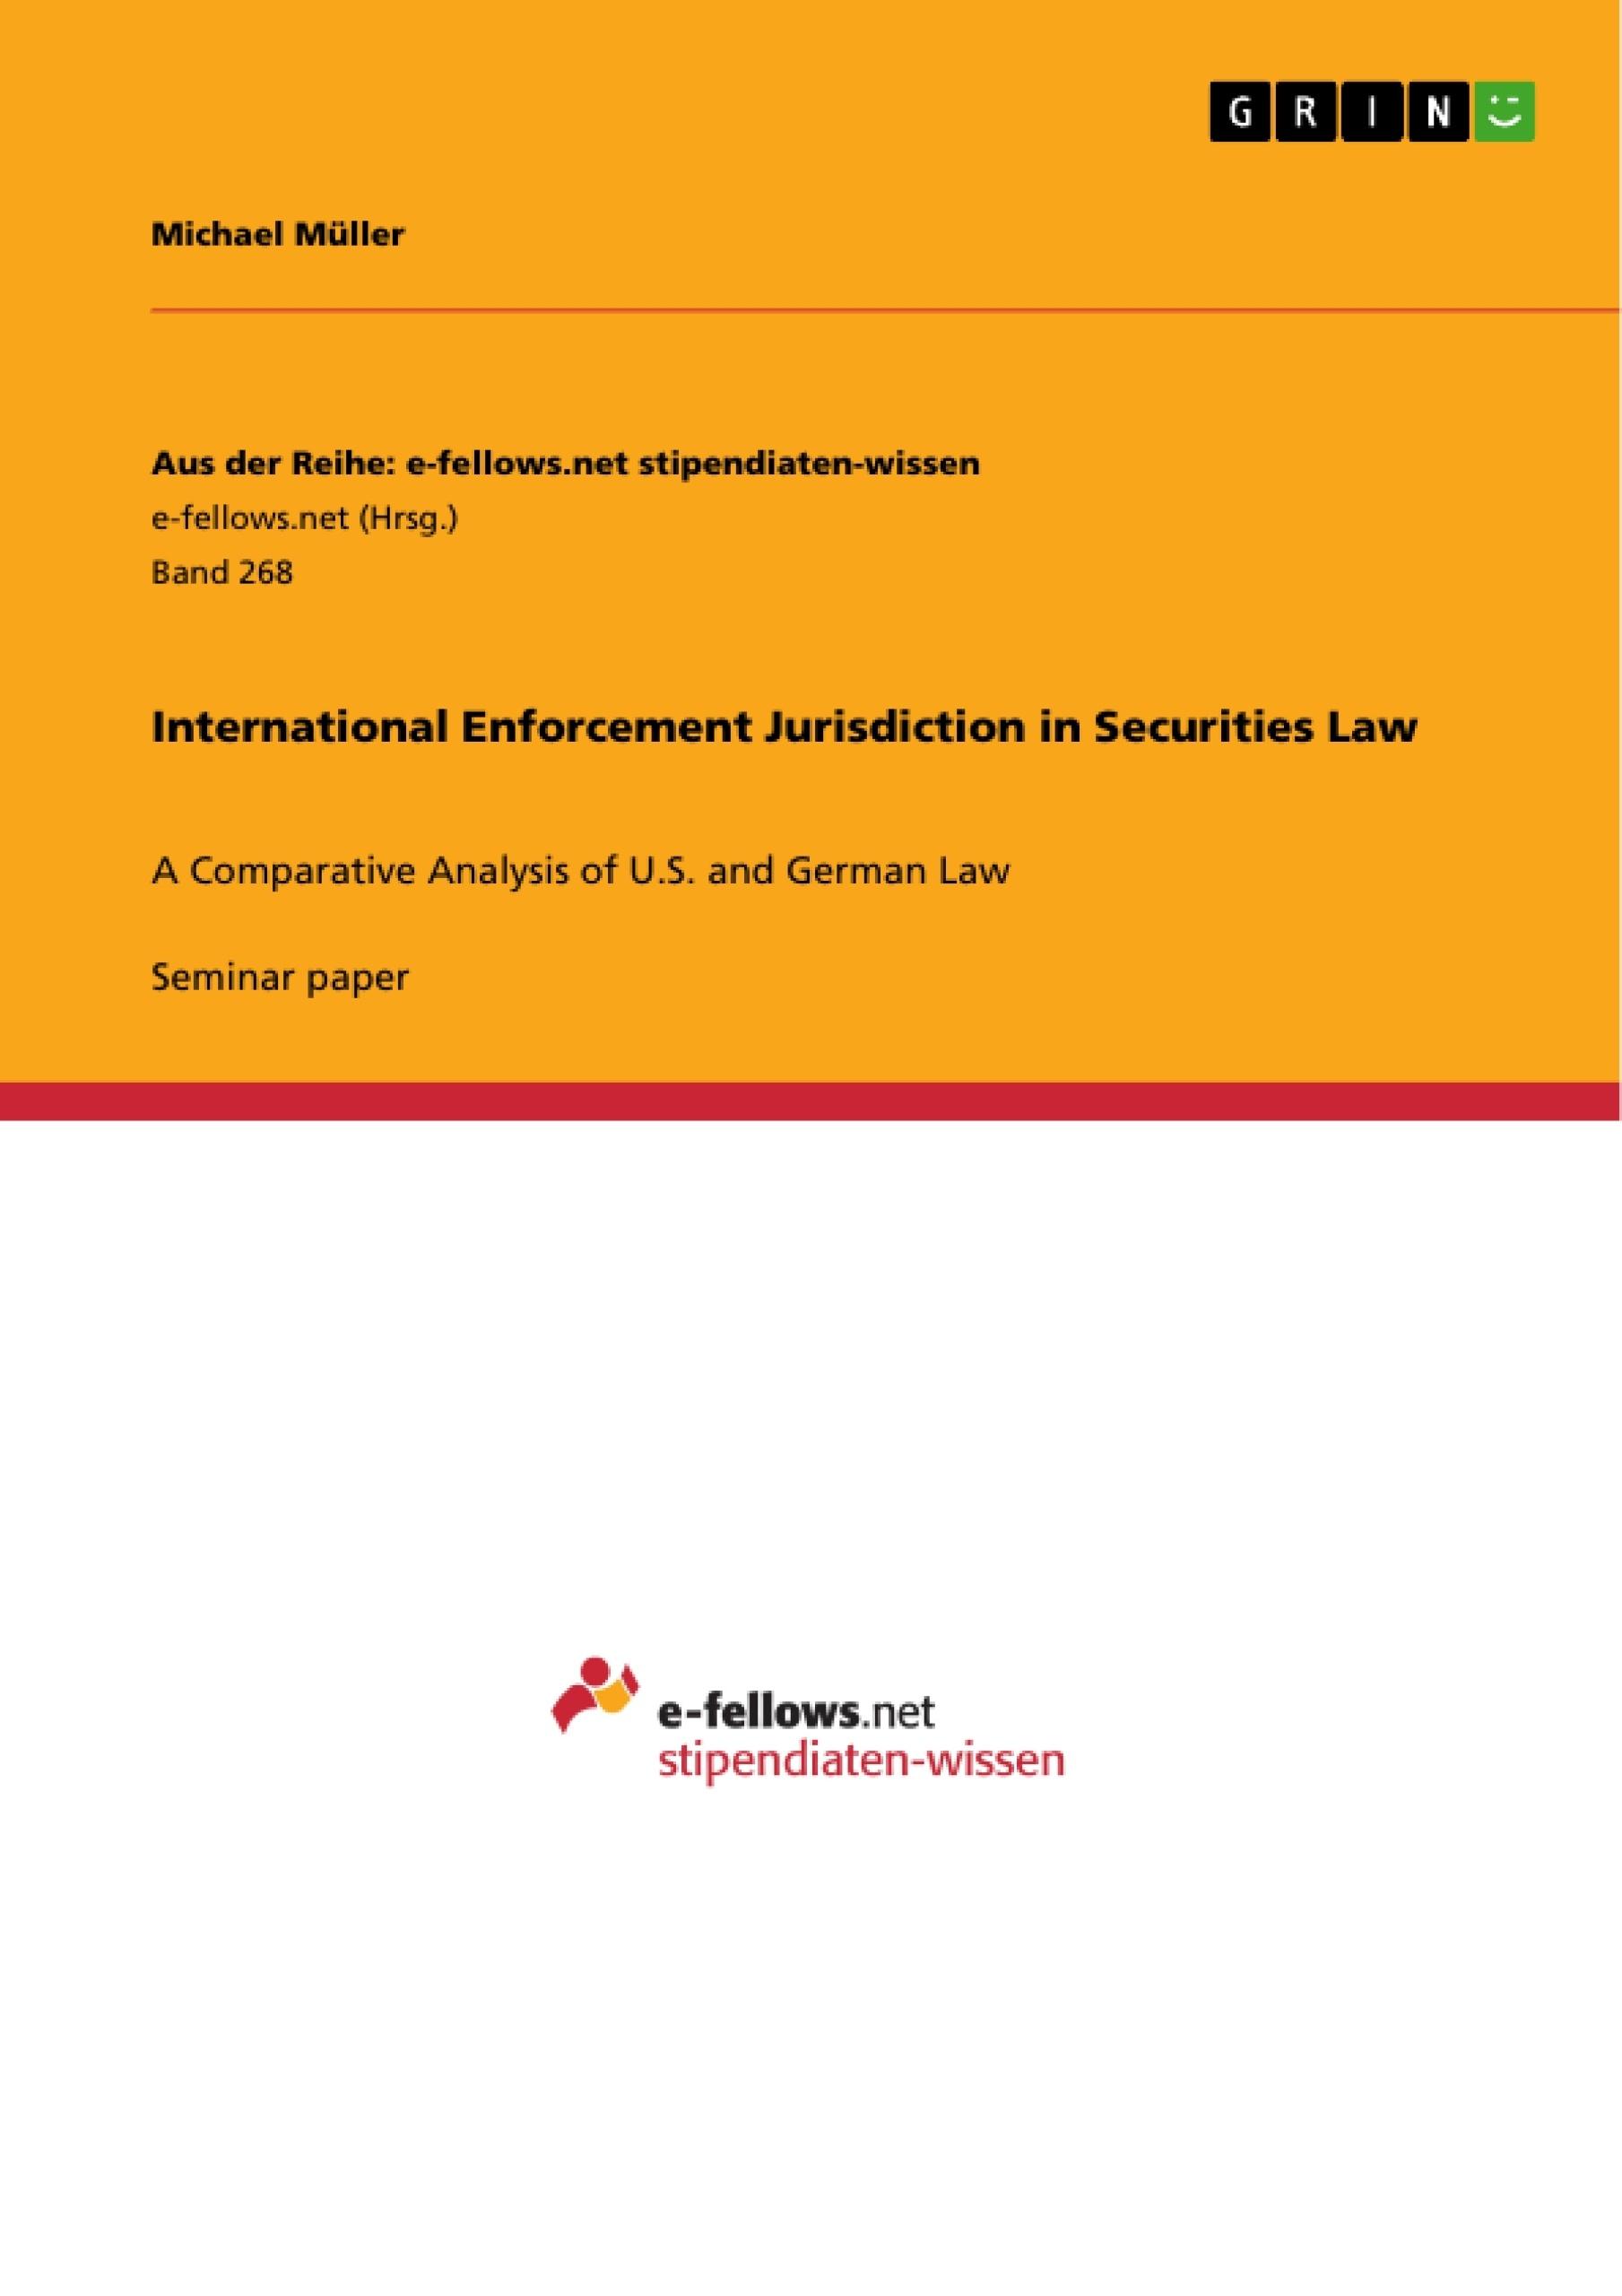 Title: International Enforcement Jurisdiction in Securities Law